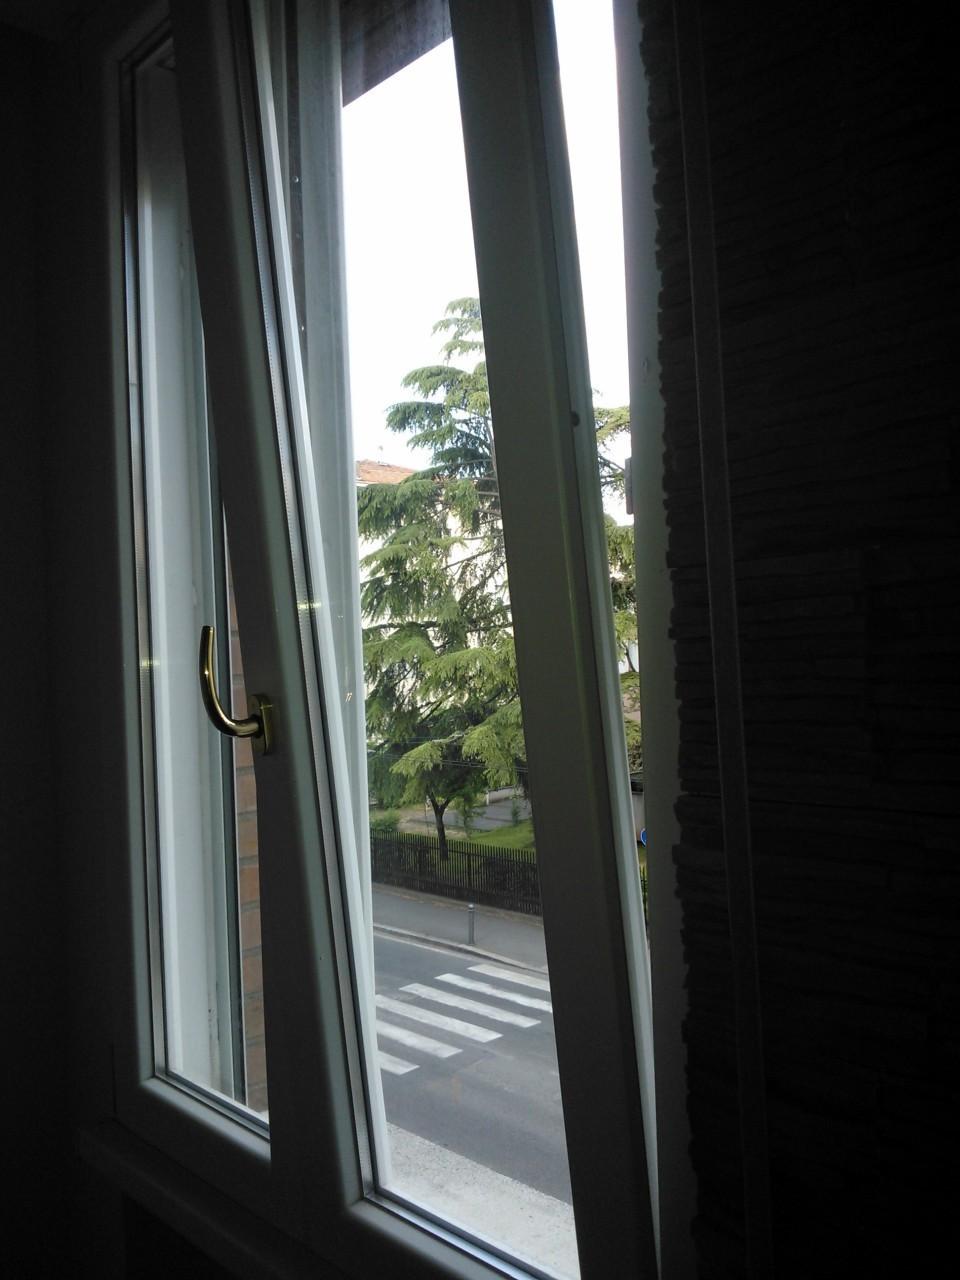 Bilocale Parma Via Zarotto 29 13